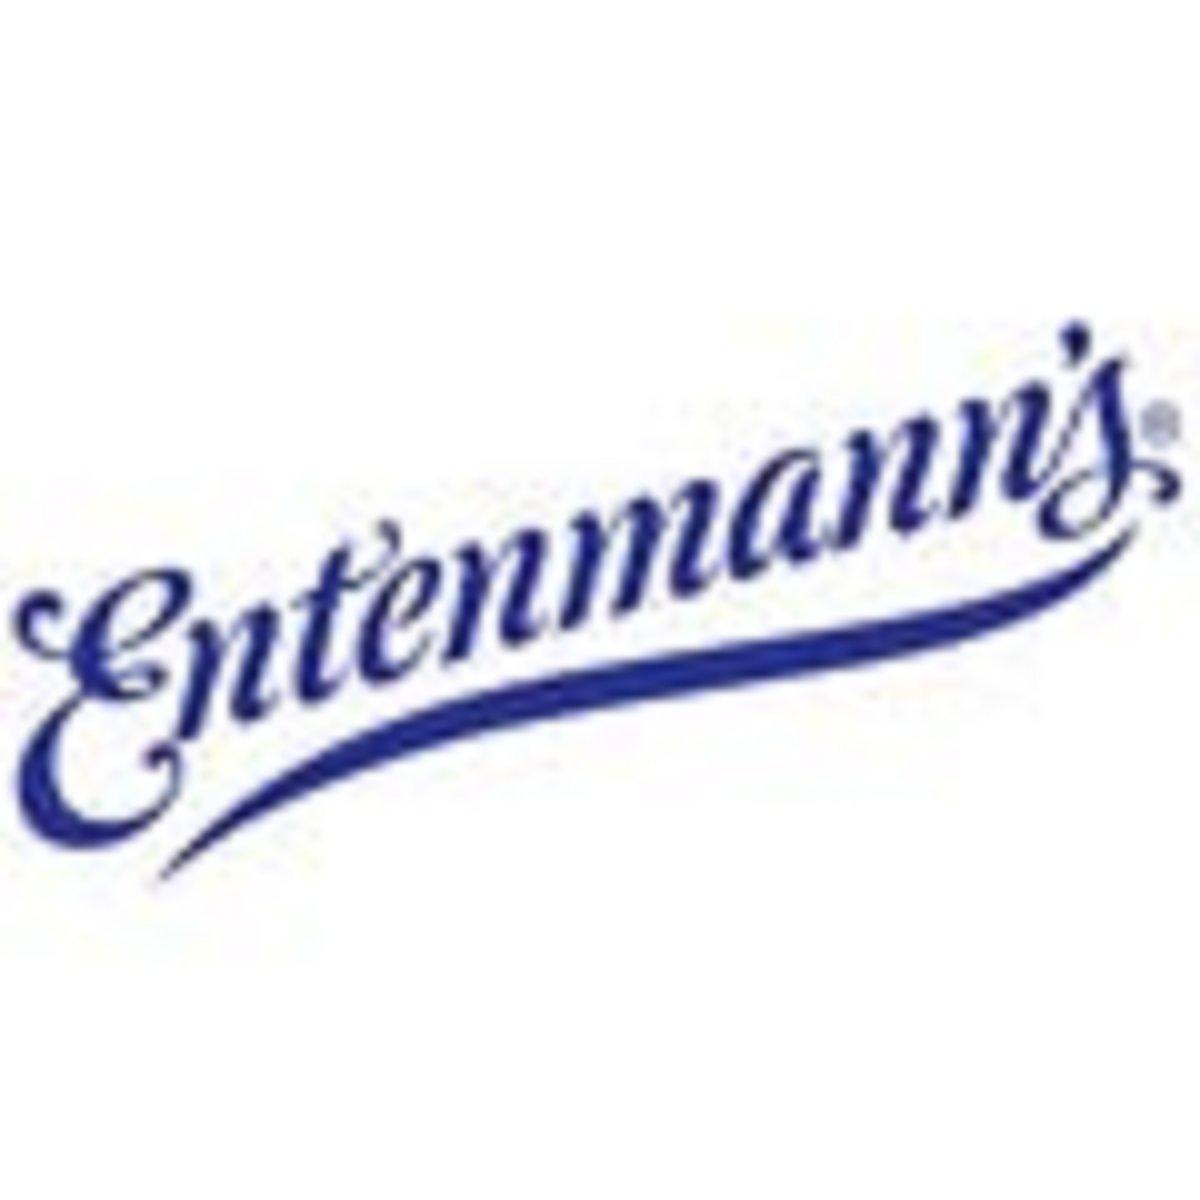 Entenmann's Dark Roast Coffee K-Cups 4 10 cup boxes